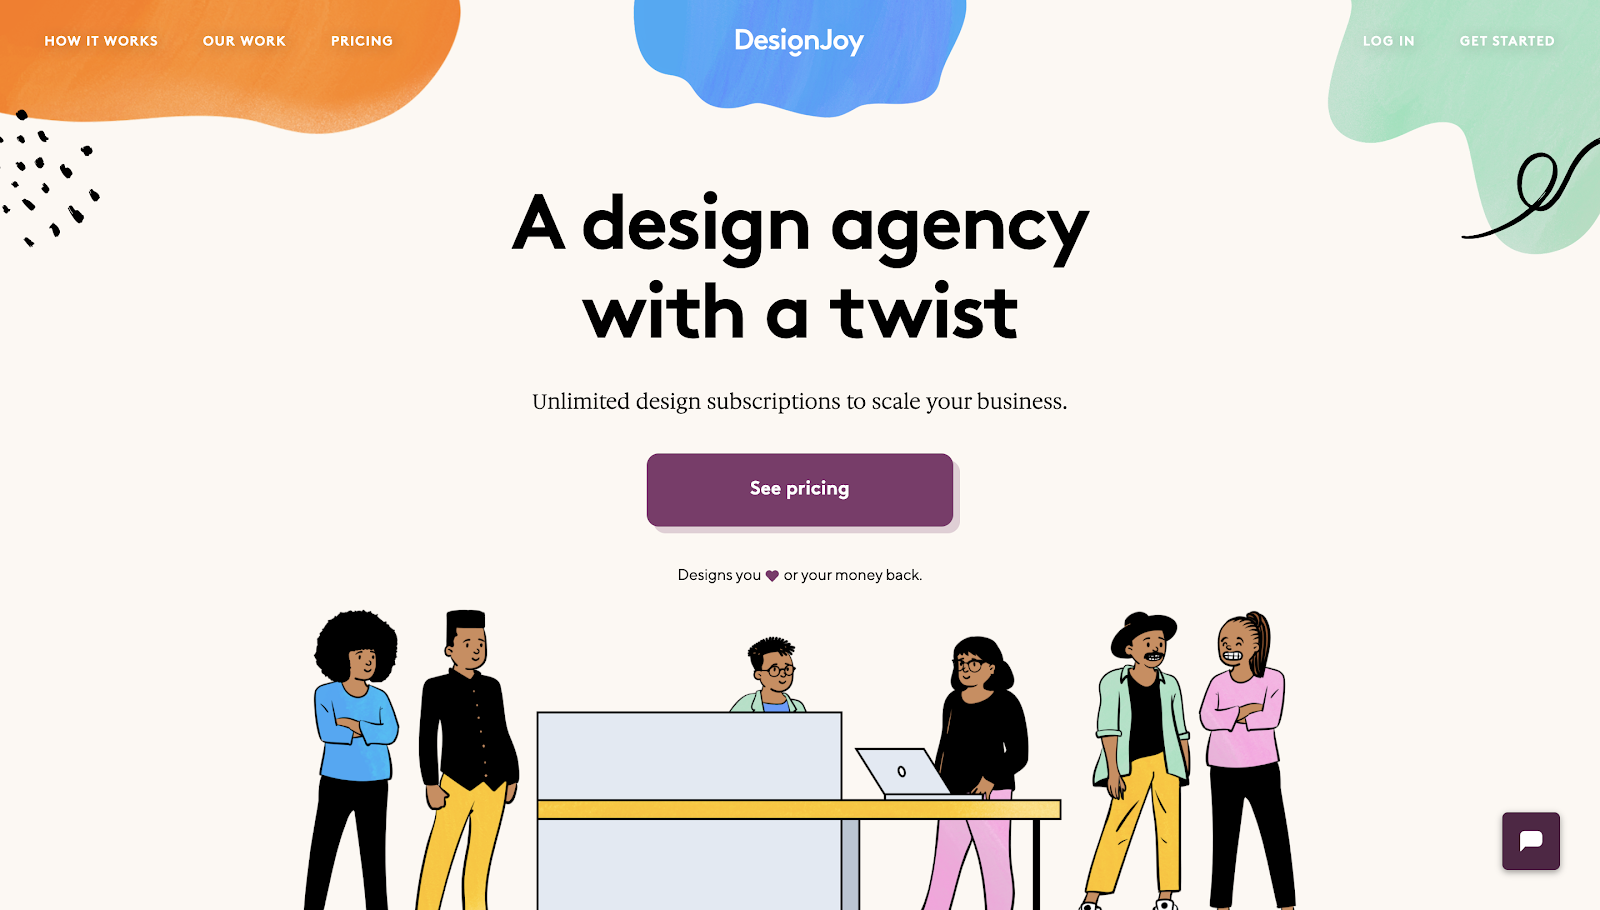 DesignJoy